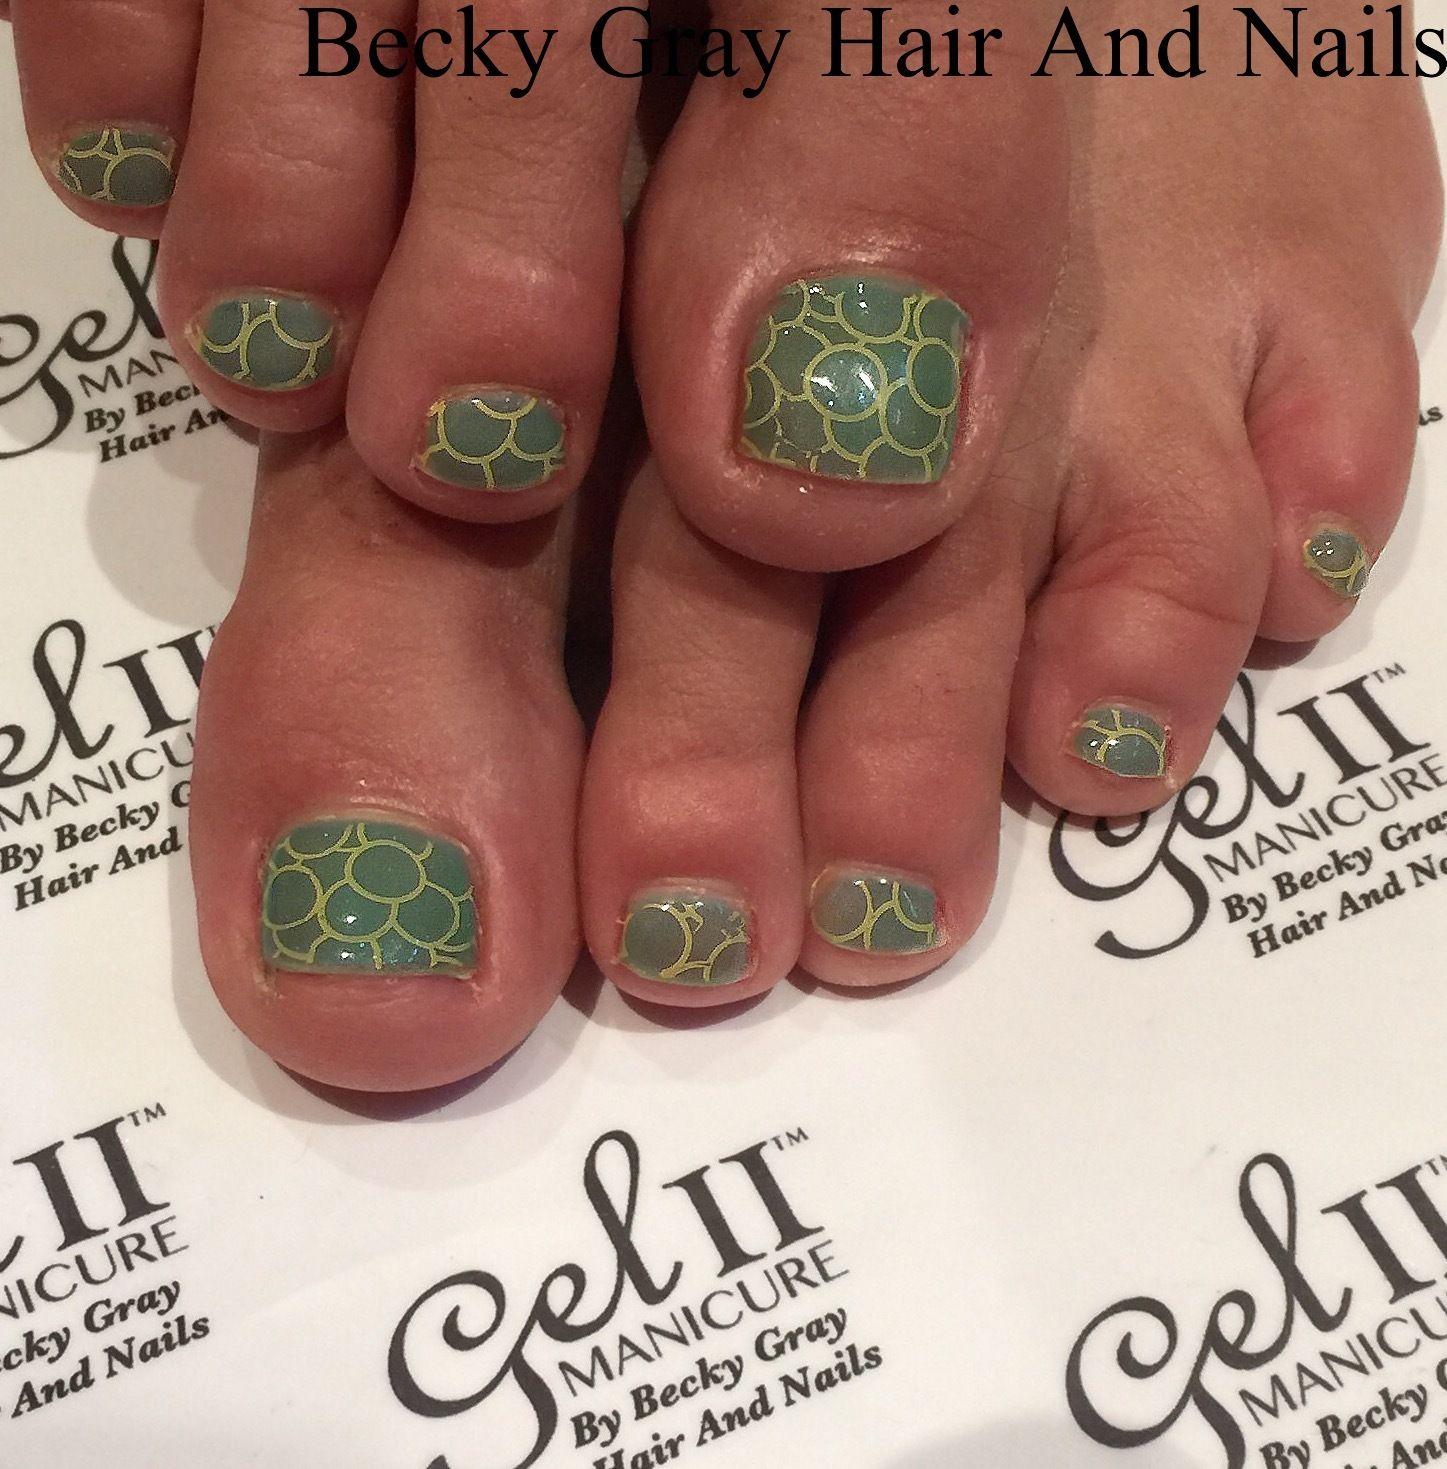 #gelio #pedicure aloha bay bay #moyoulondon stamping #showscratch #manicure #nails #tcbg